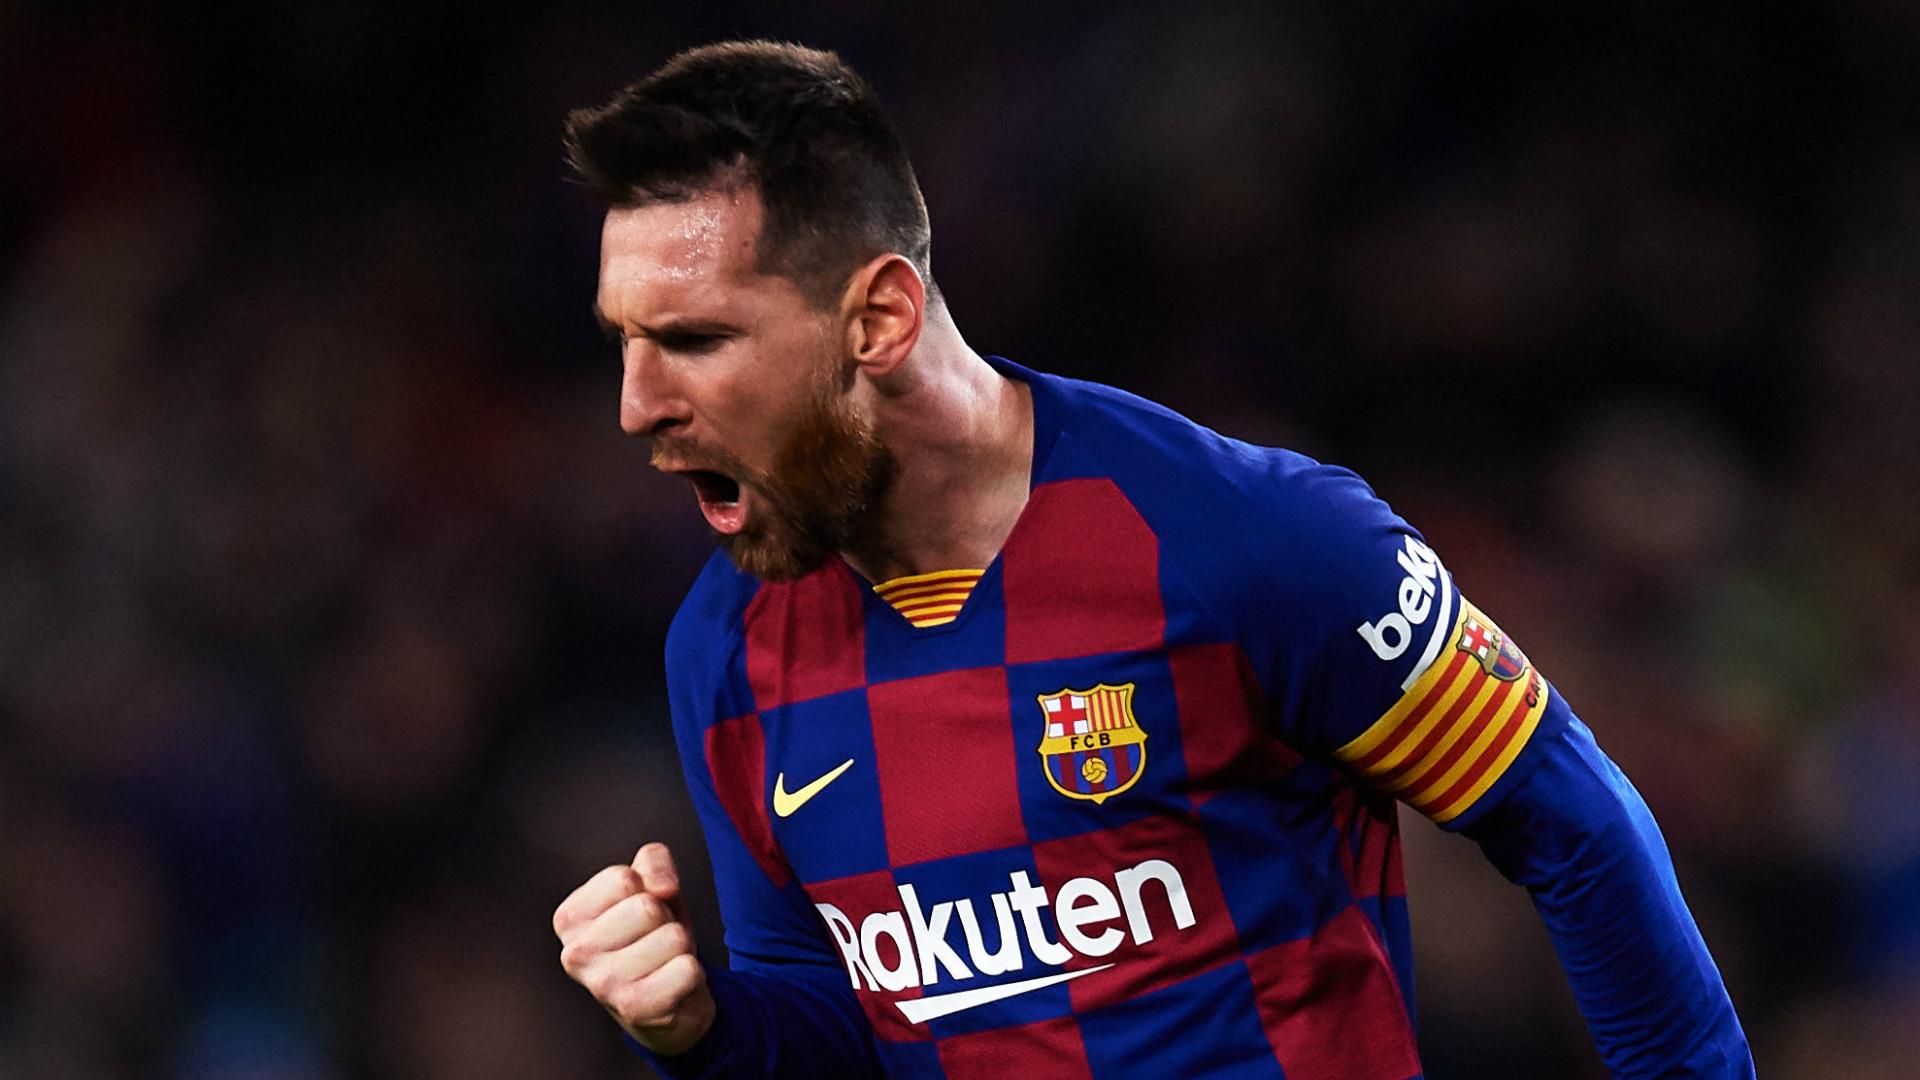 Barcelona 4-1 Celta Vigo: Messi hat-trick lifts gloom at Camp Nou